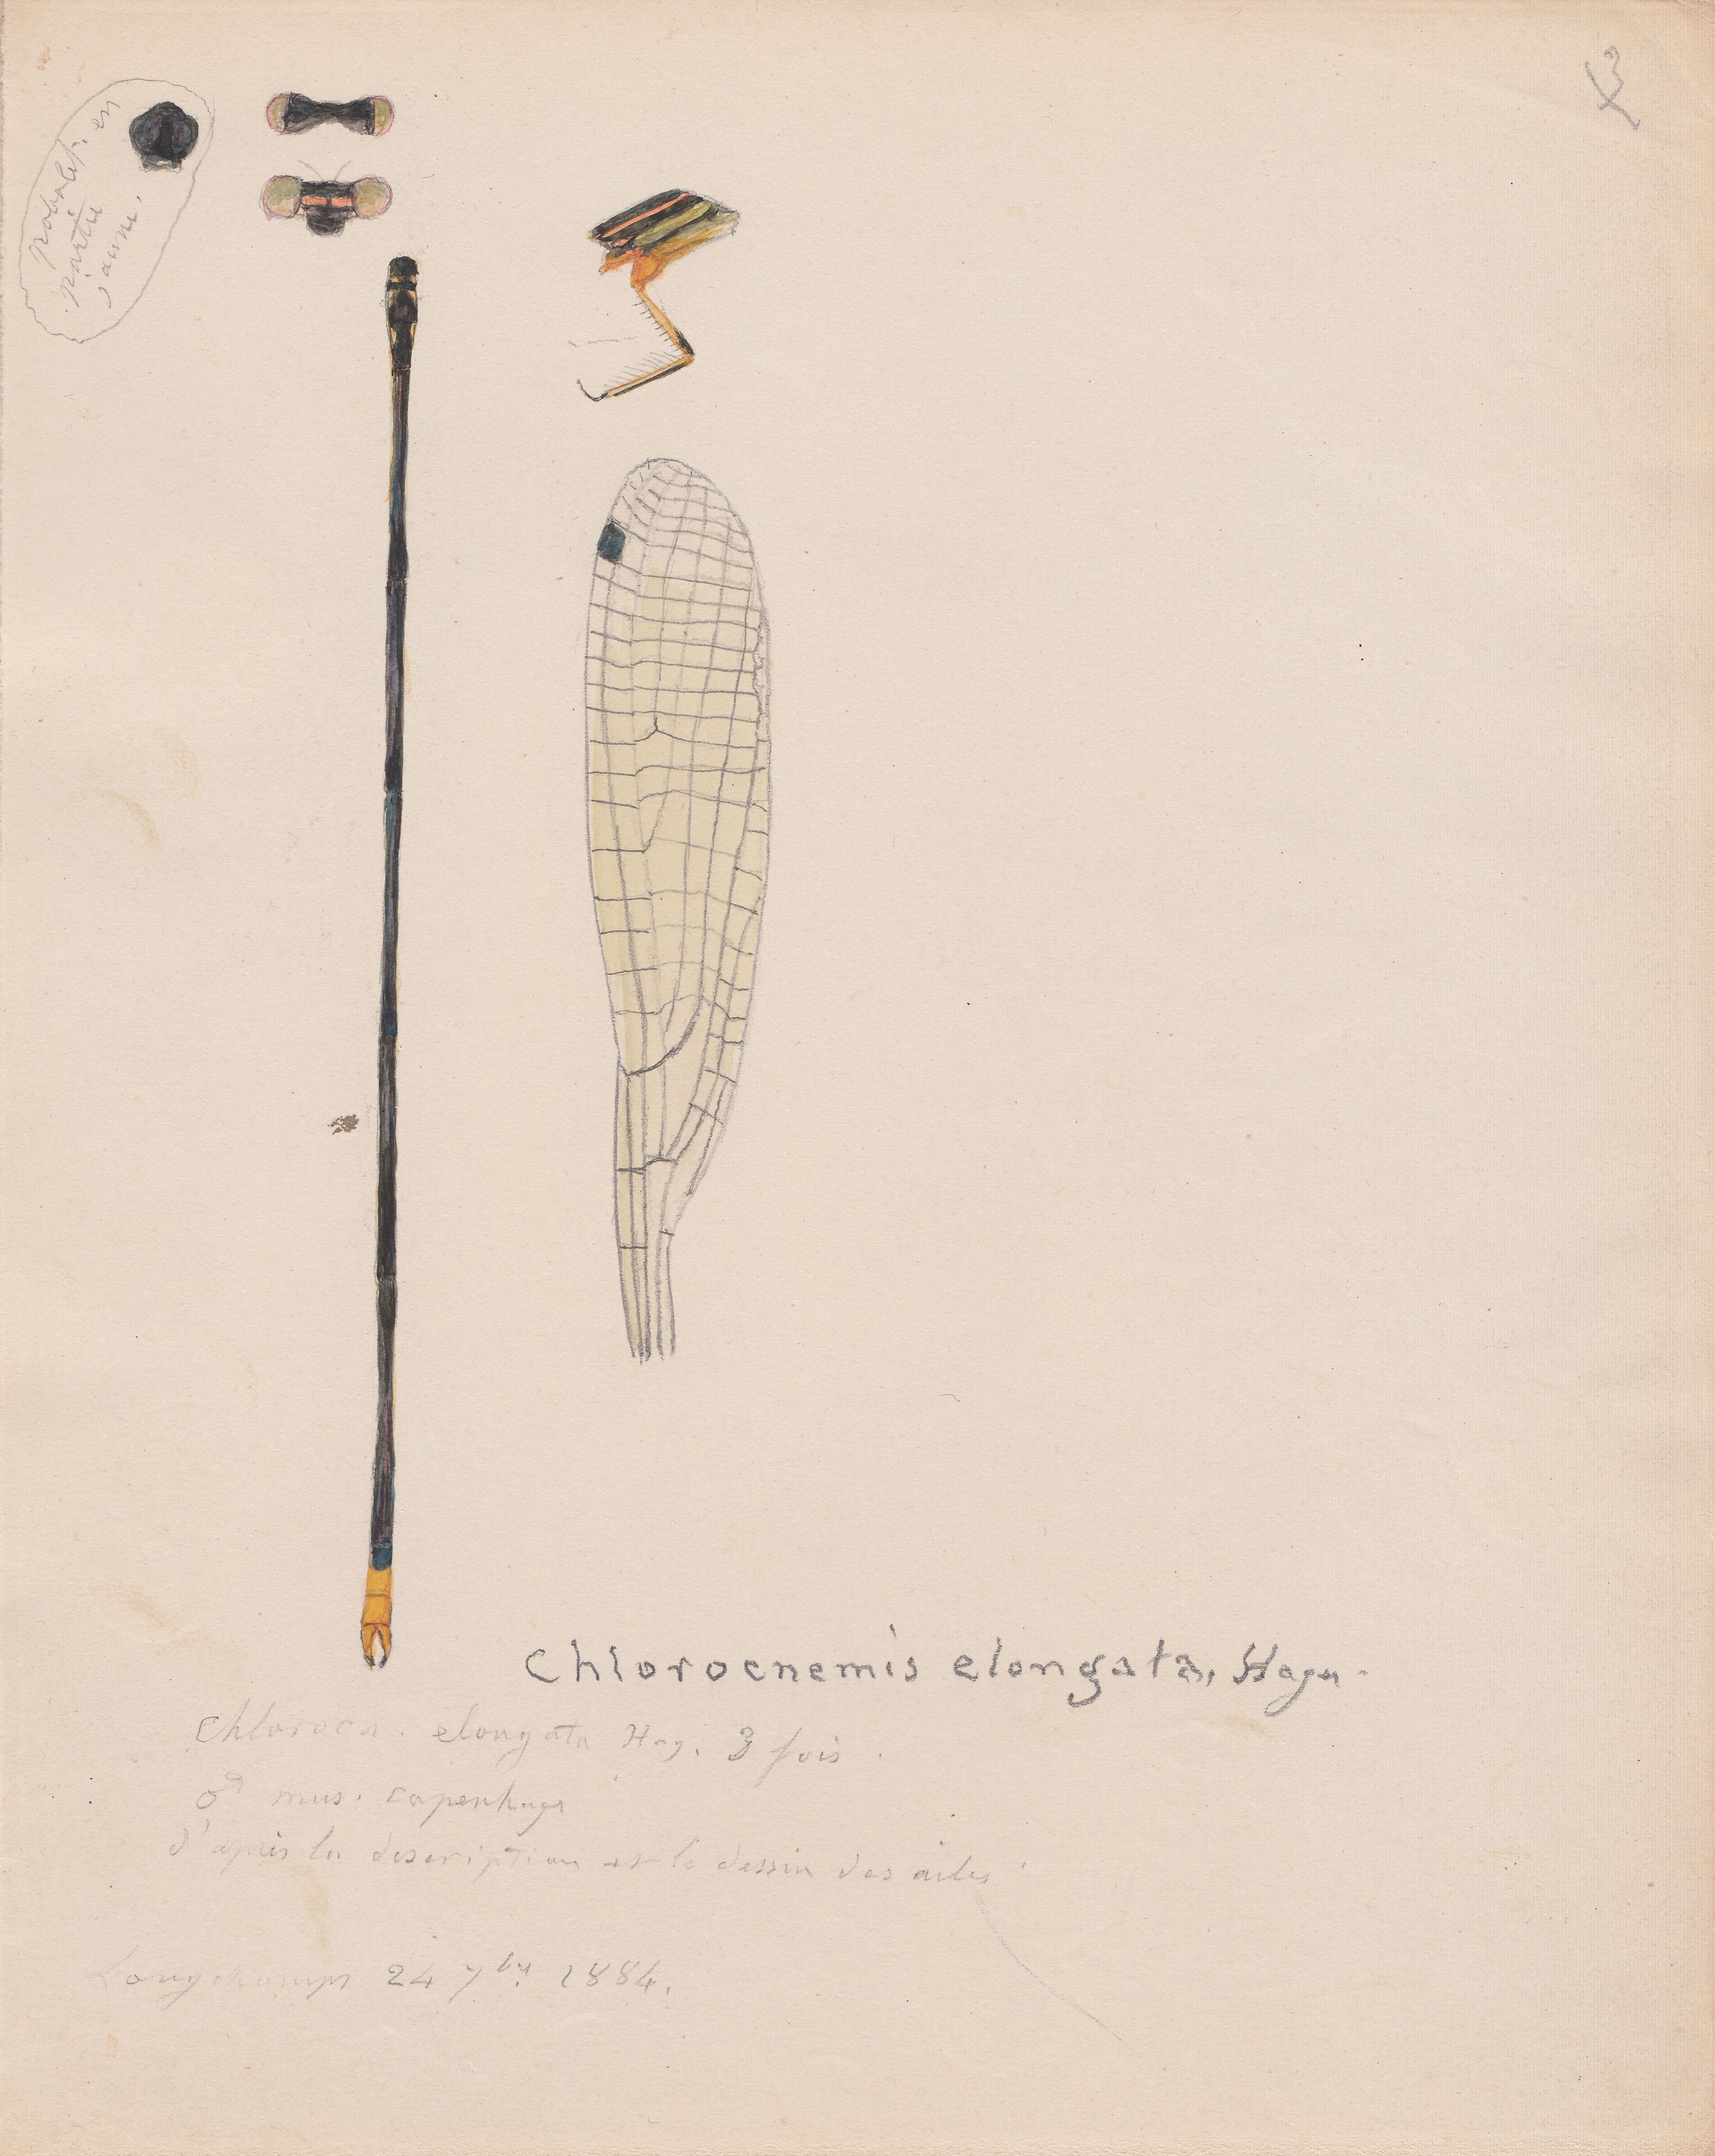 Chlorocnemis elongata.jpg